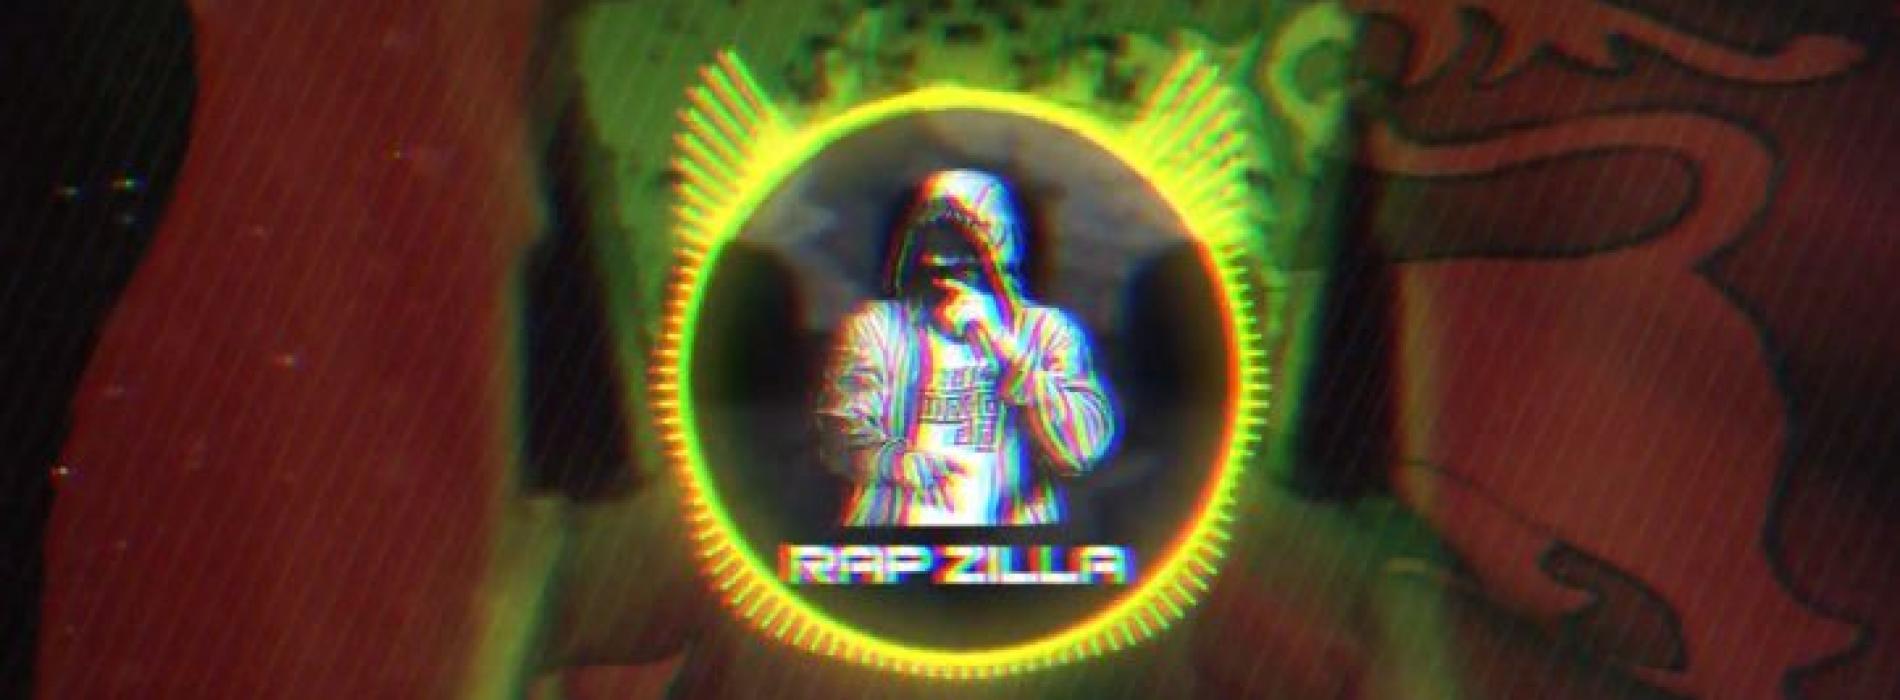 225 Kathiraya | කතිරය 225 By RapZilla LKM